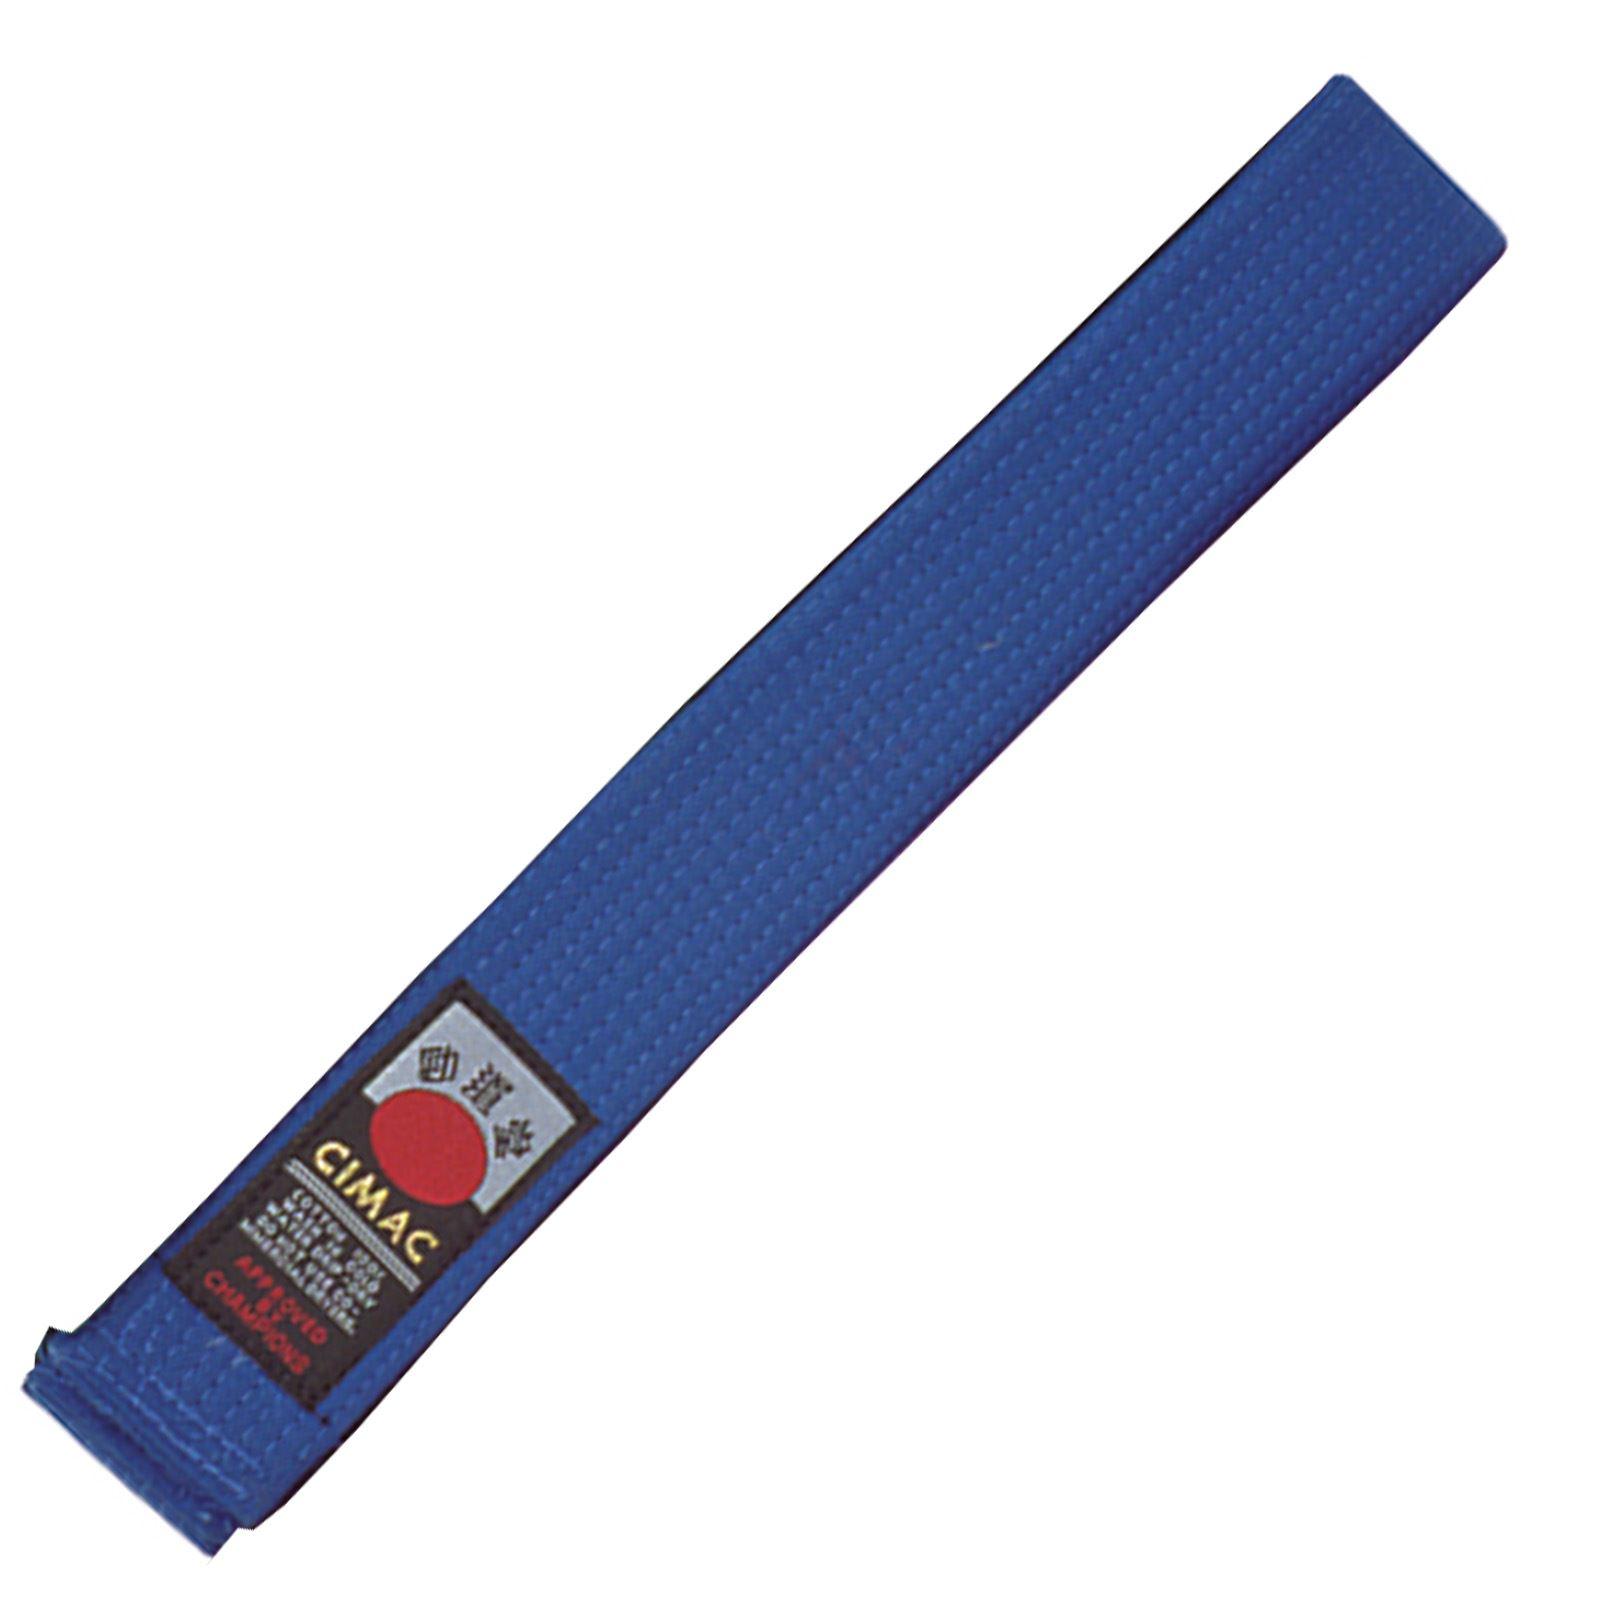 Cimac-Judo-Karate-Taekwondo-Plain-Coloured-Martial-Arts-Belt-UniformVarious-Size thumbnail 7